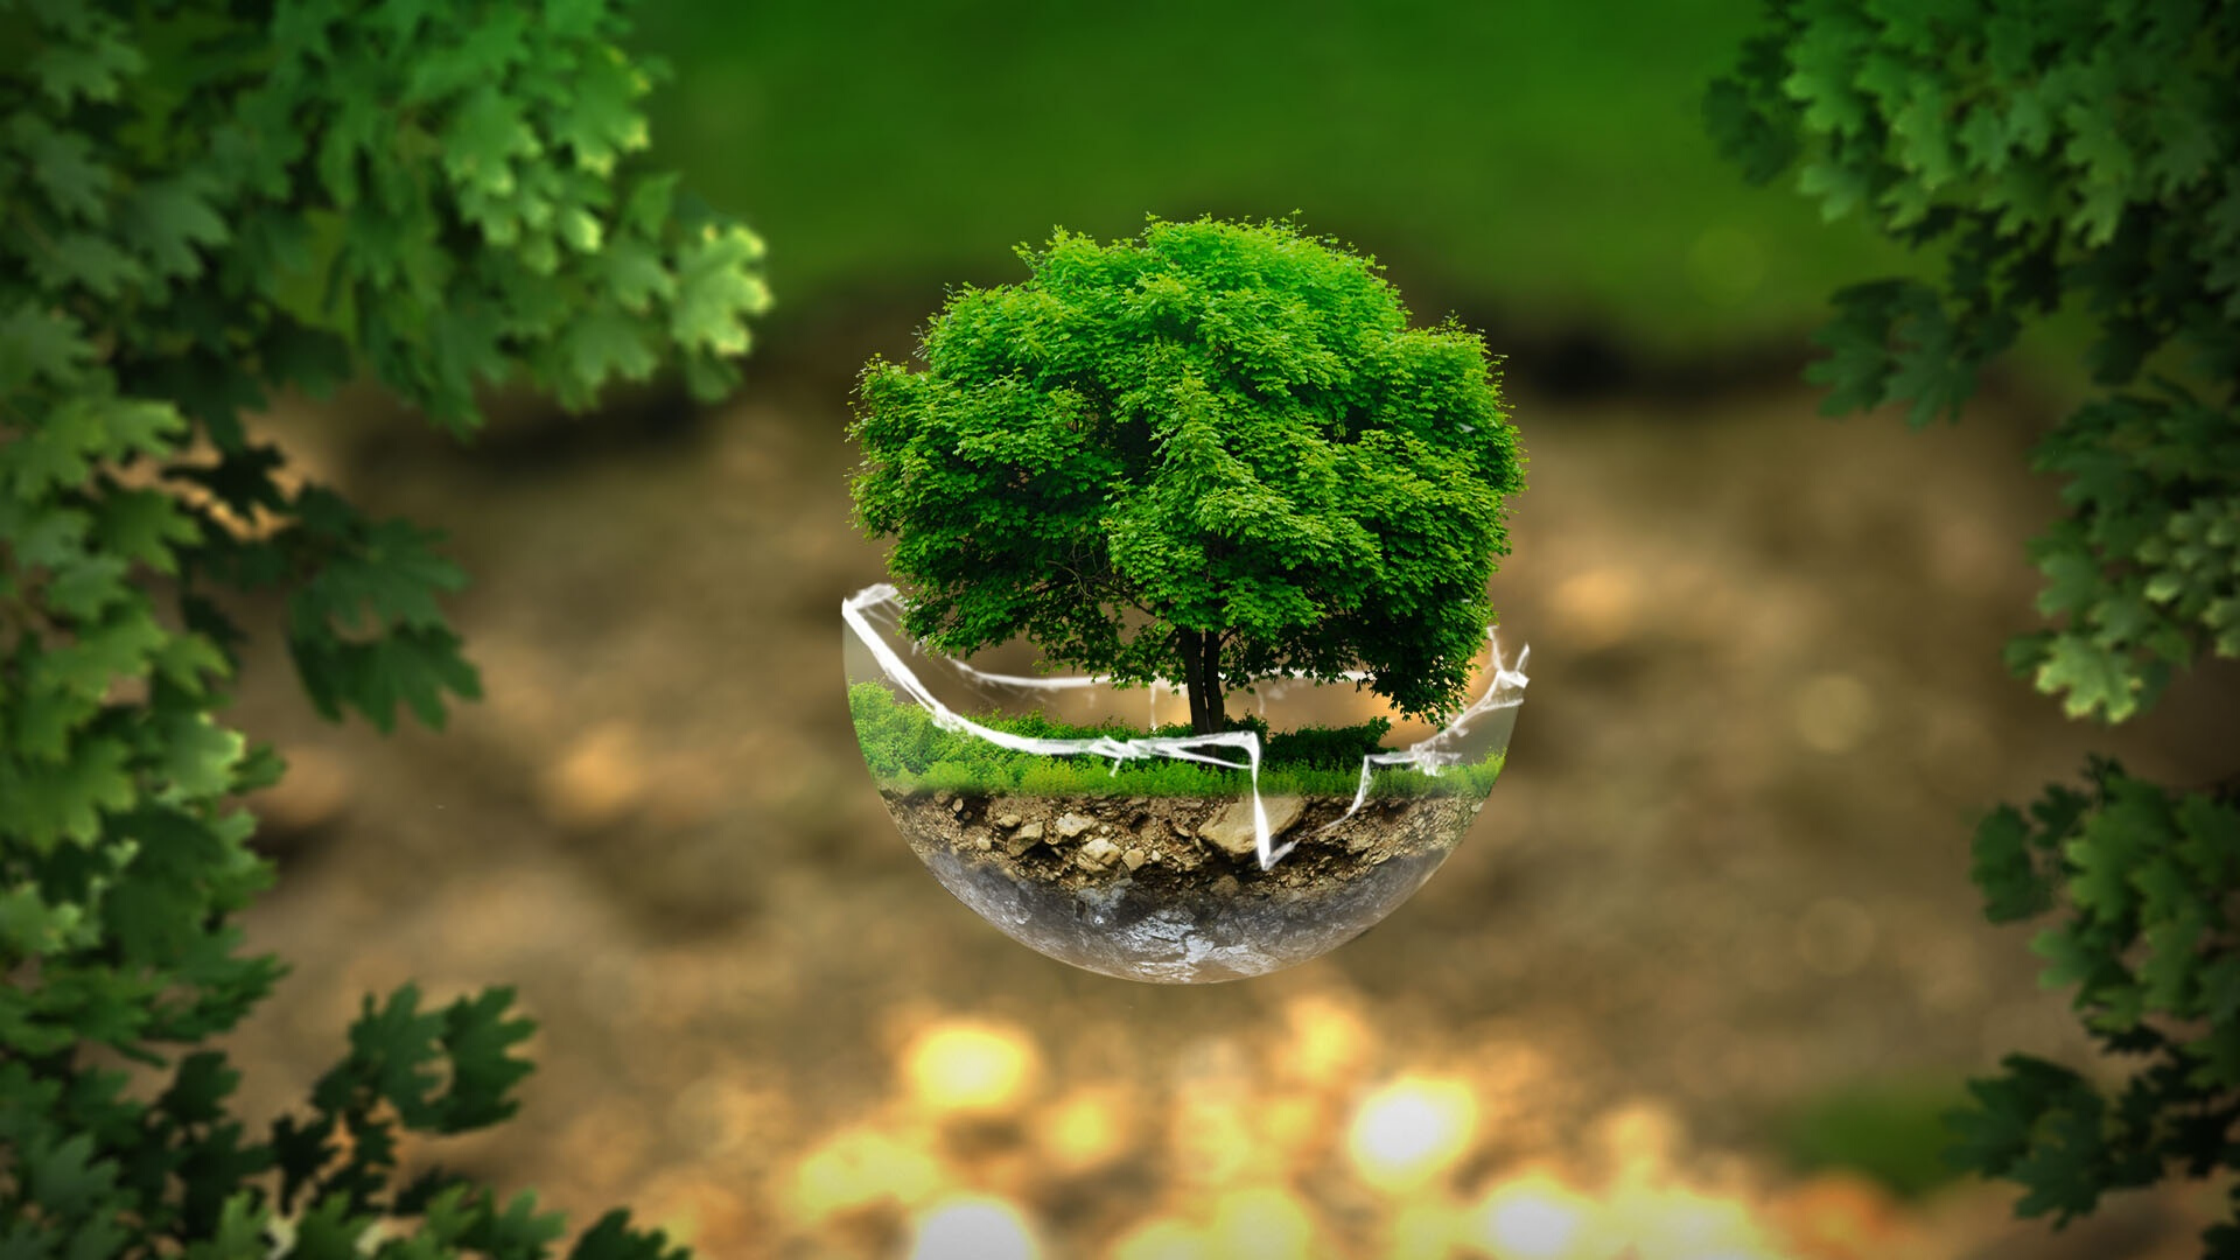 visual greenhouse gas emissions